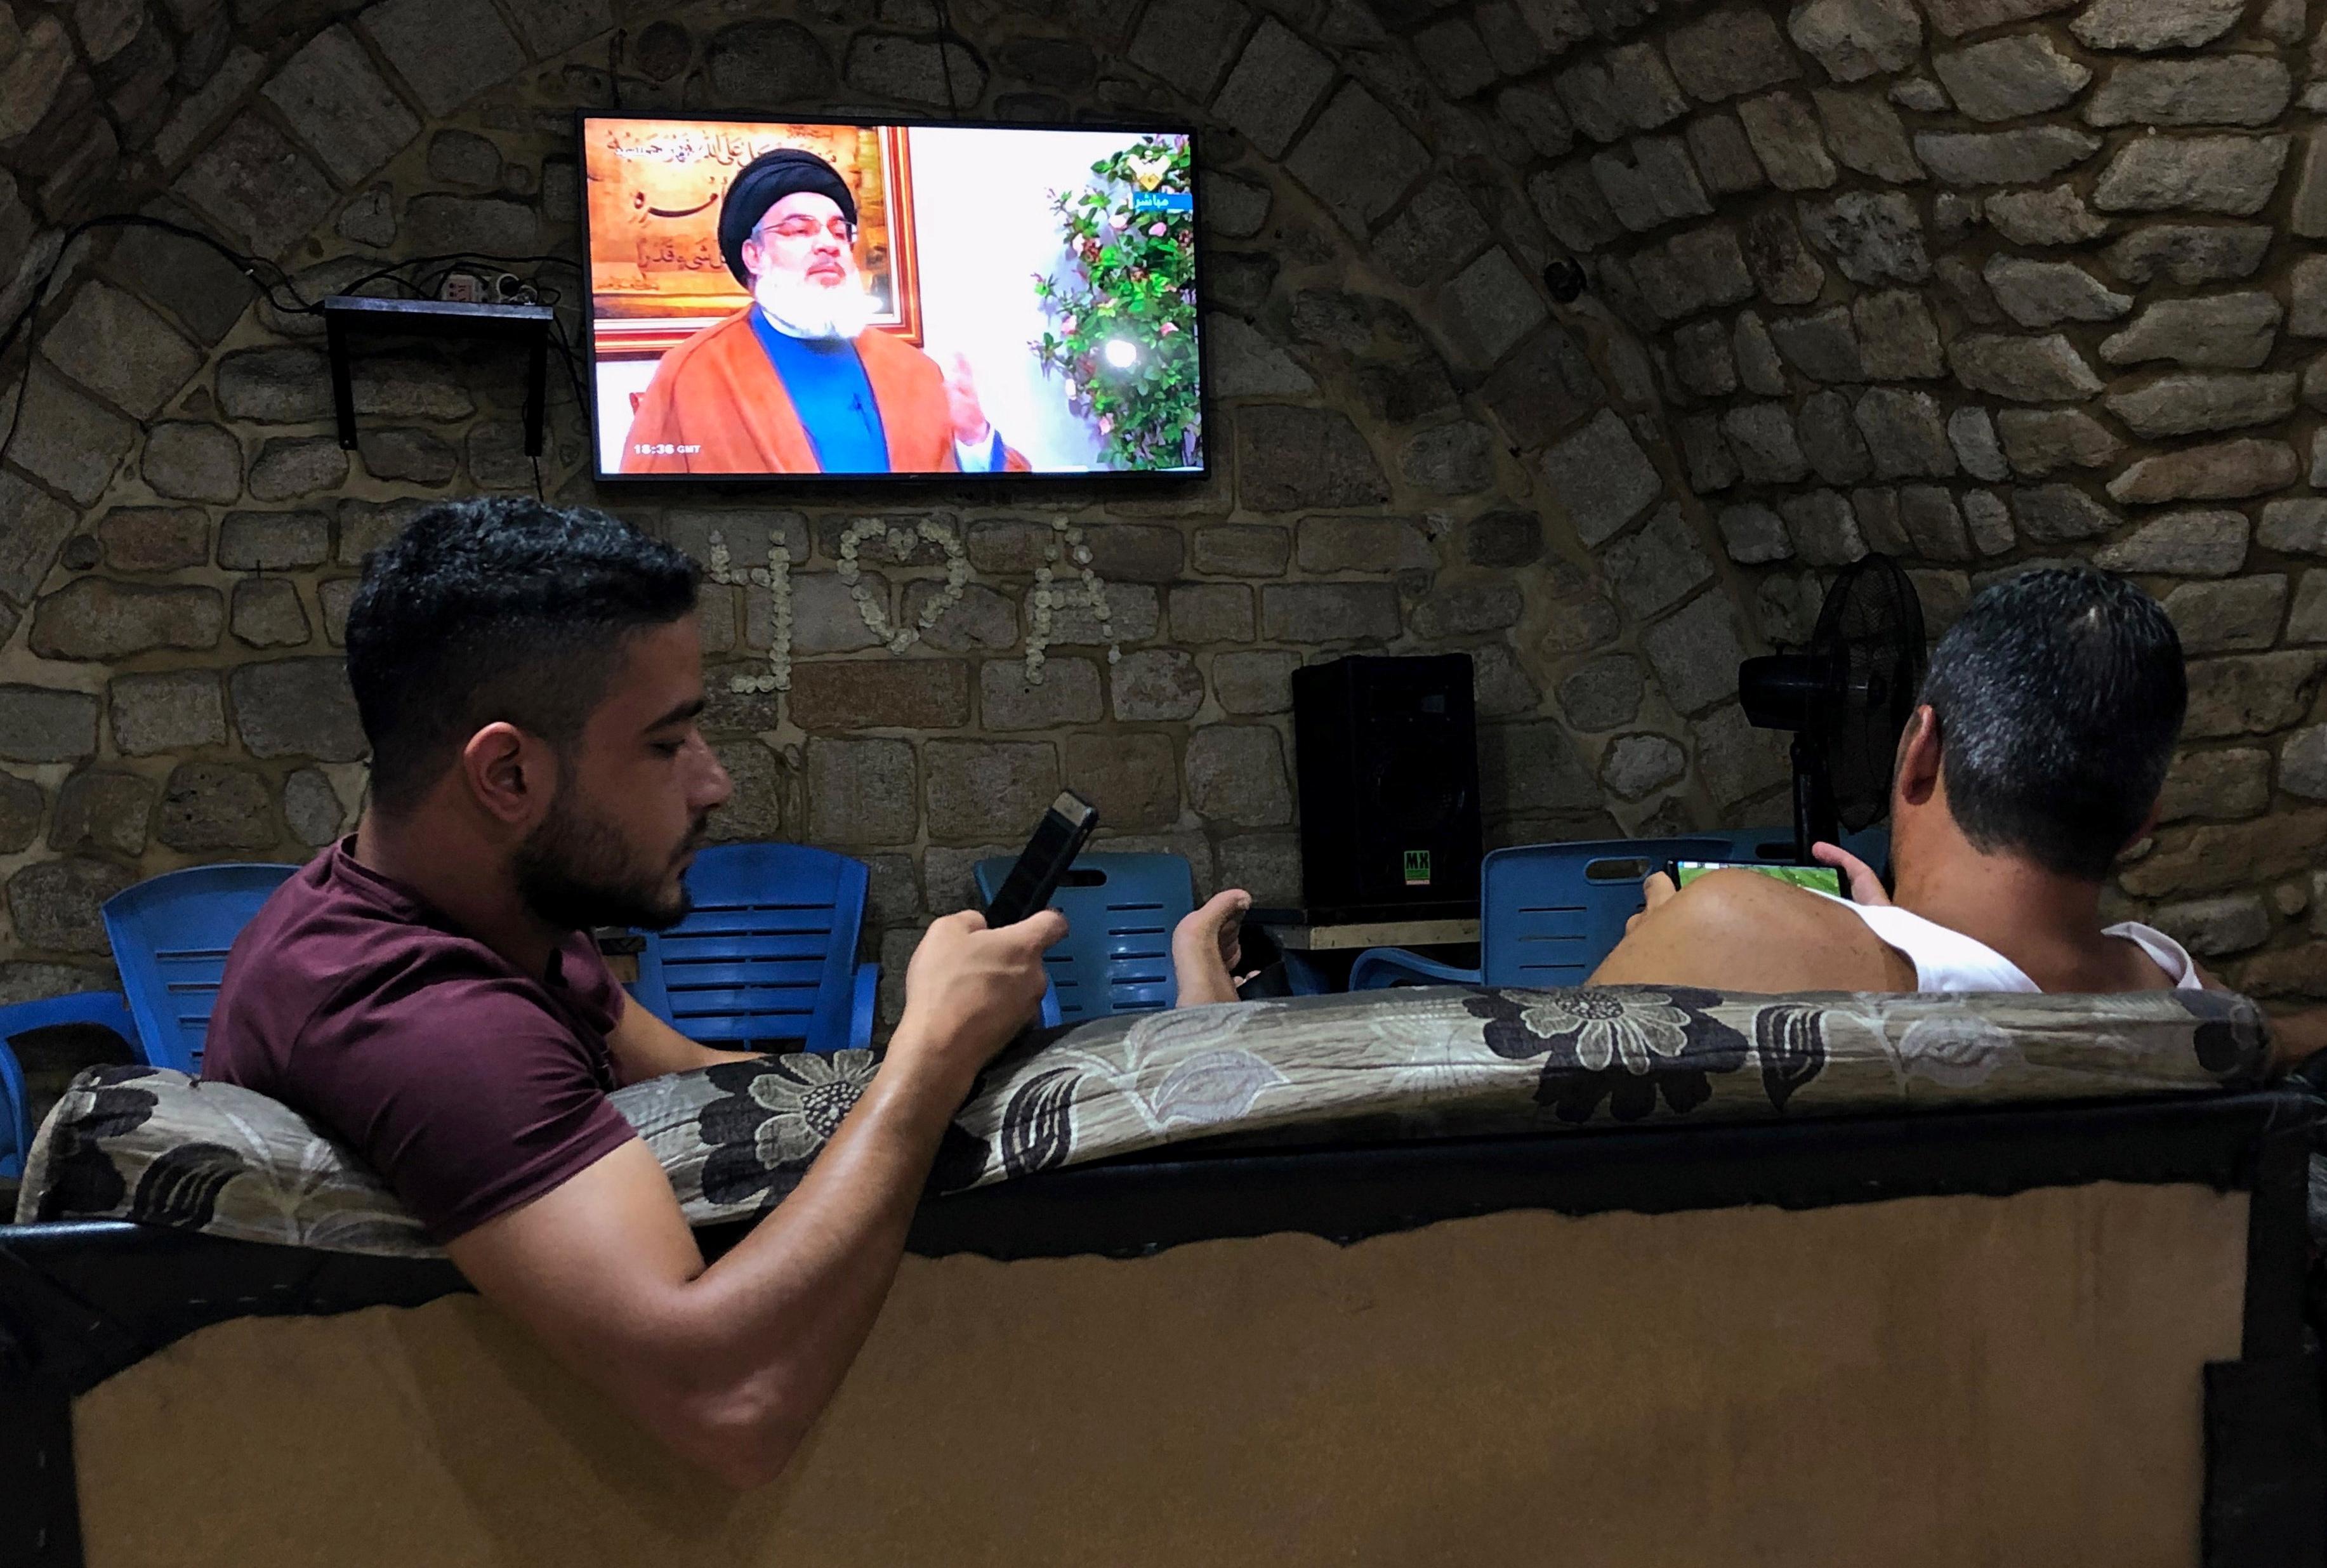 Hezbollah leader says U.S. seeking to talk